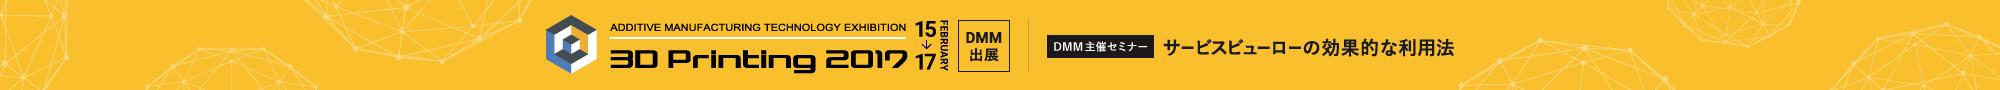 3D Printing 2017 DMM出展情報